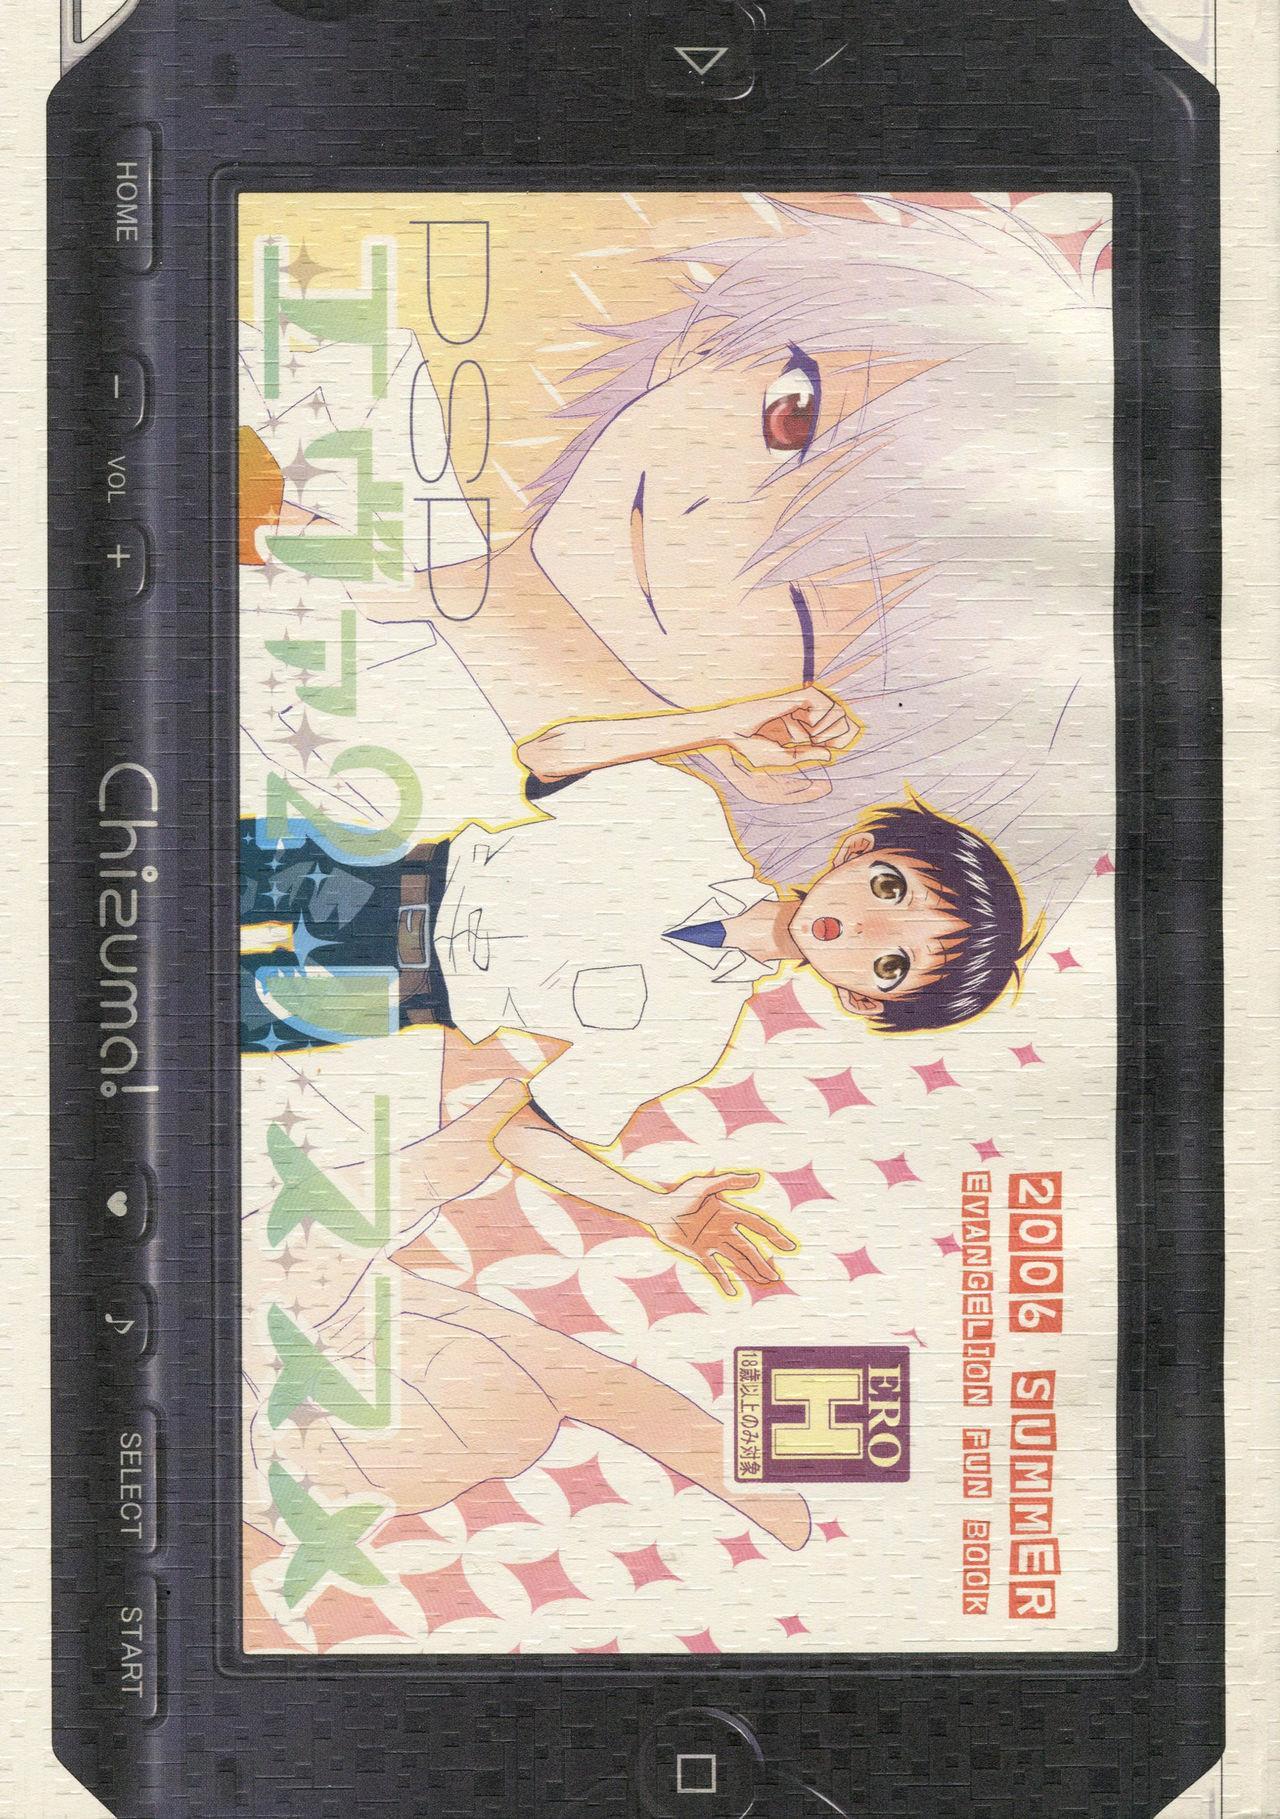 PSP Eva 2 no Susume 0